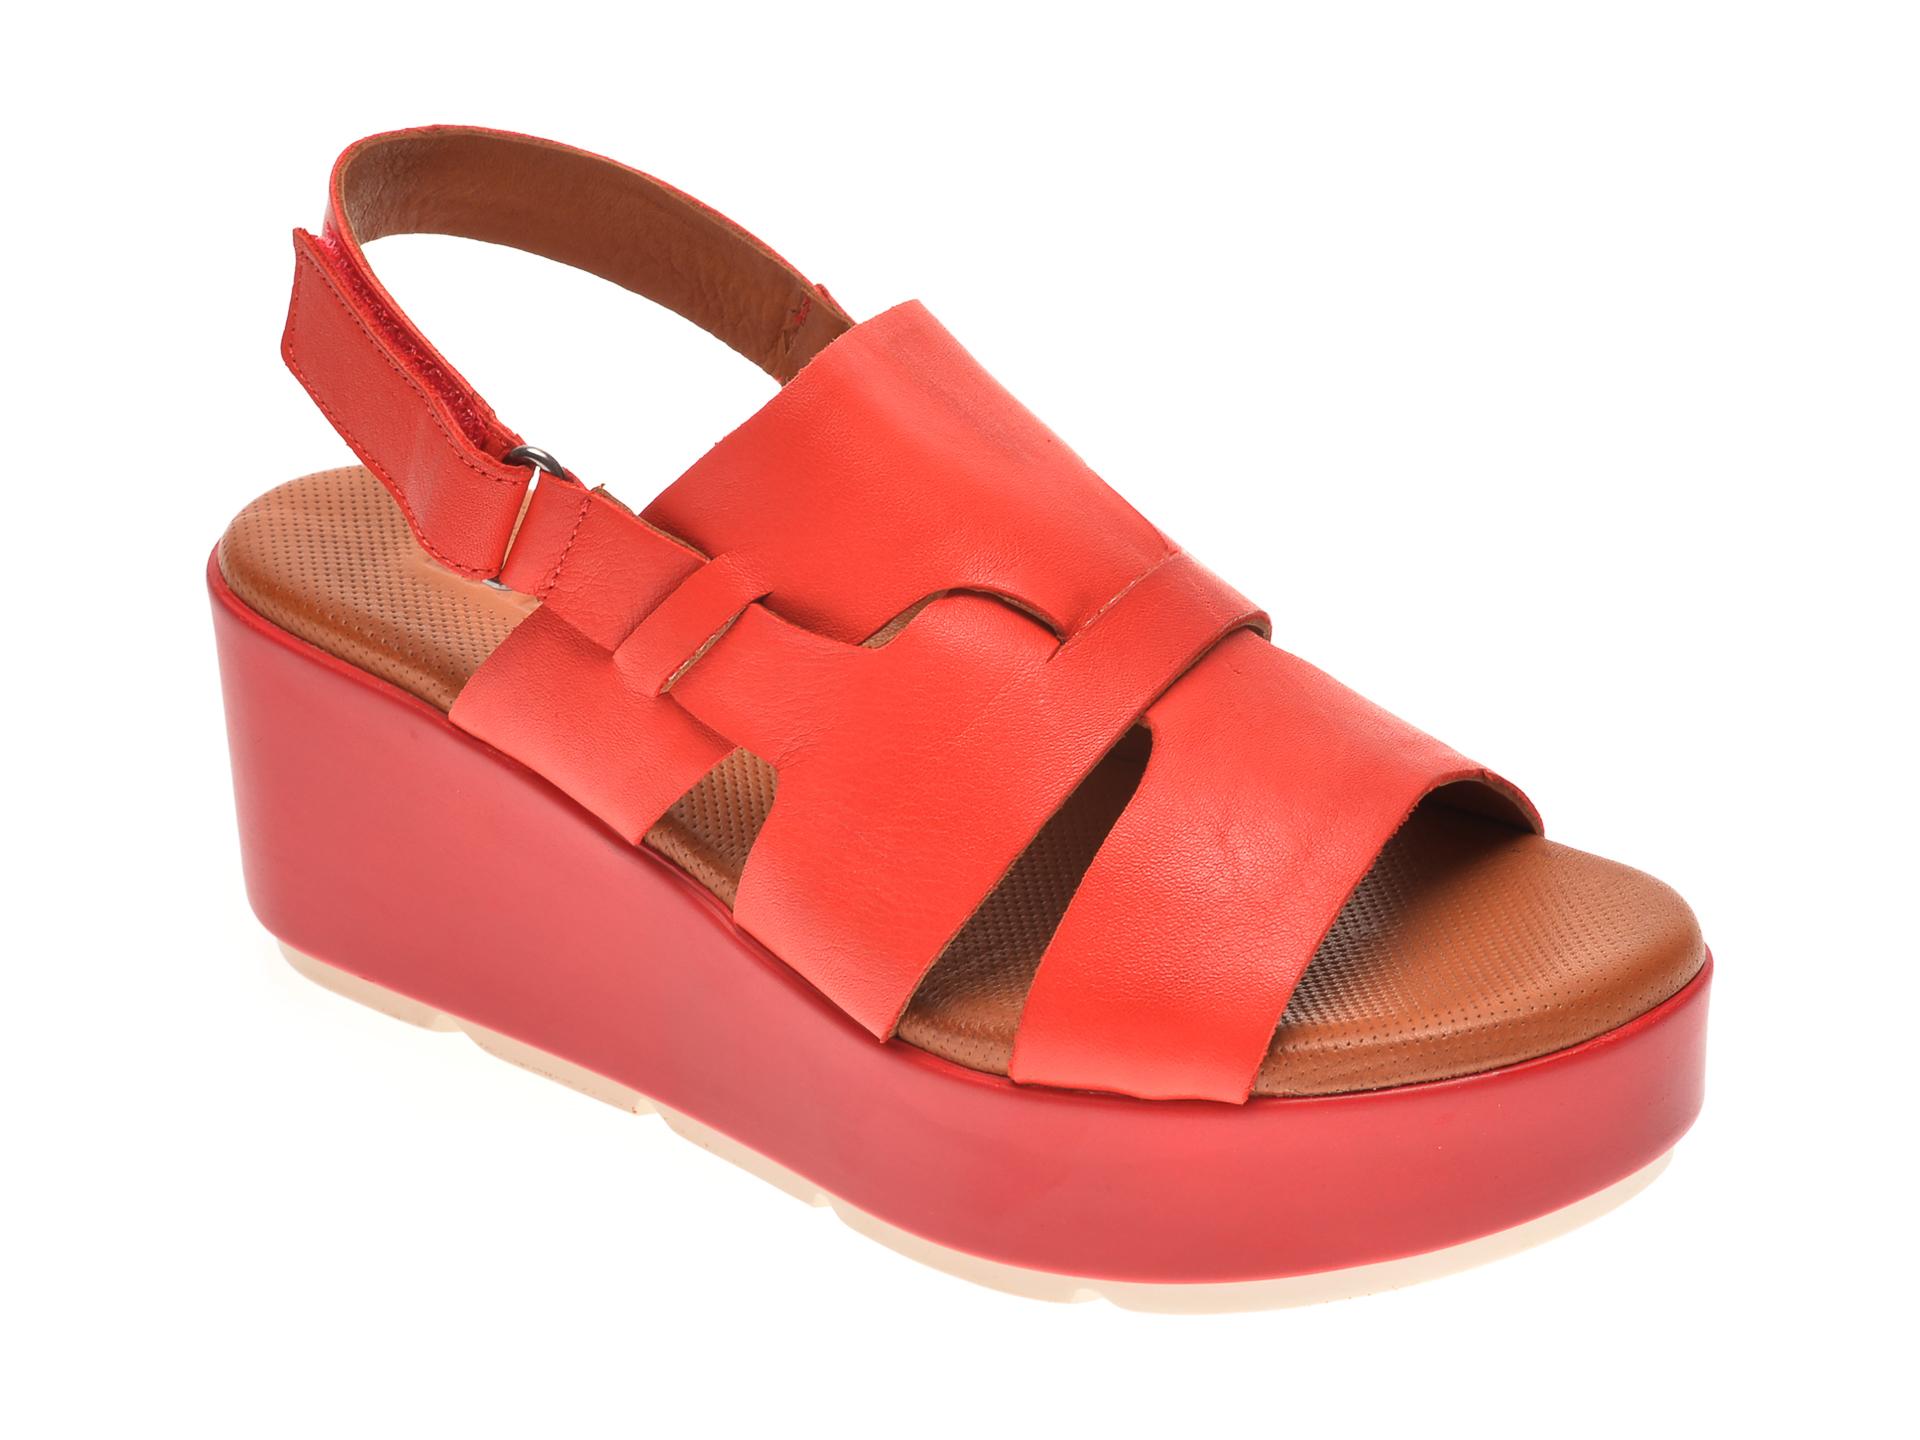 Sandale BABOOS rosii, 2519, din piele naturala imagine